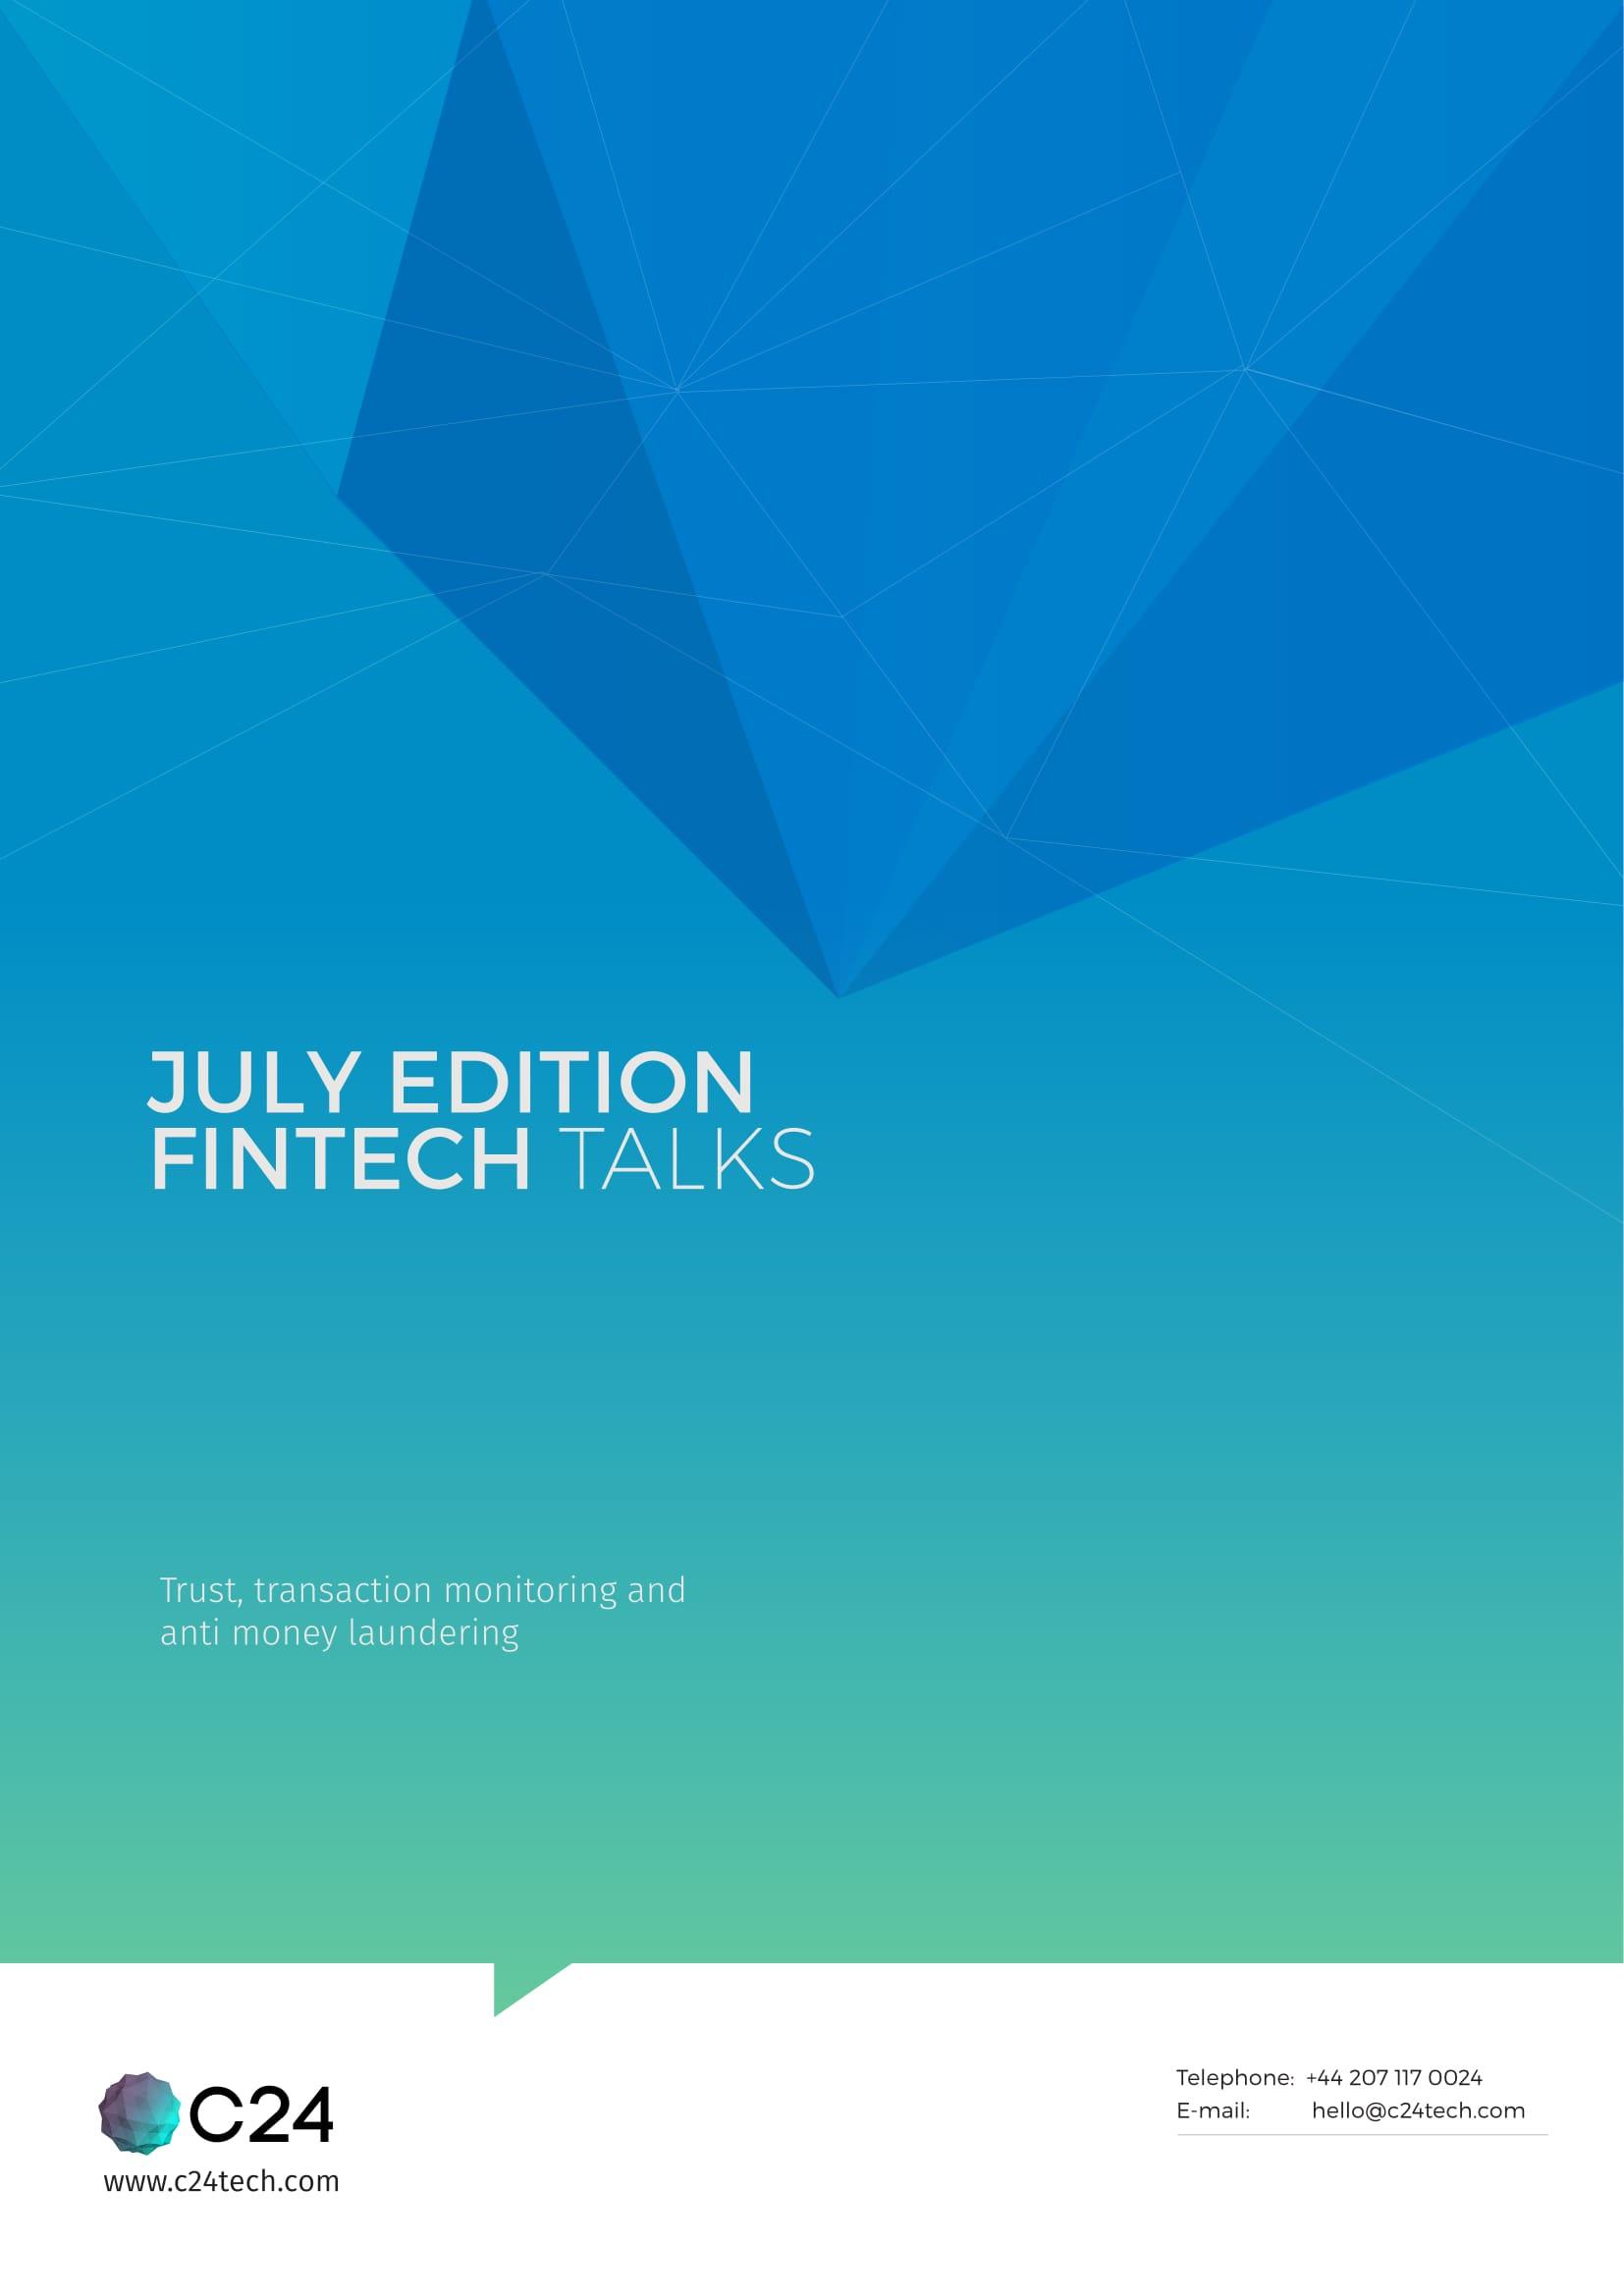 C24_FinTech_Talks_-_July_Edition-8.jpg